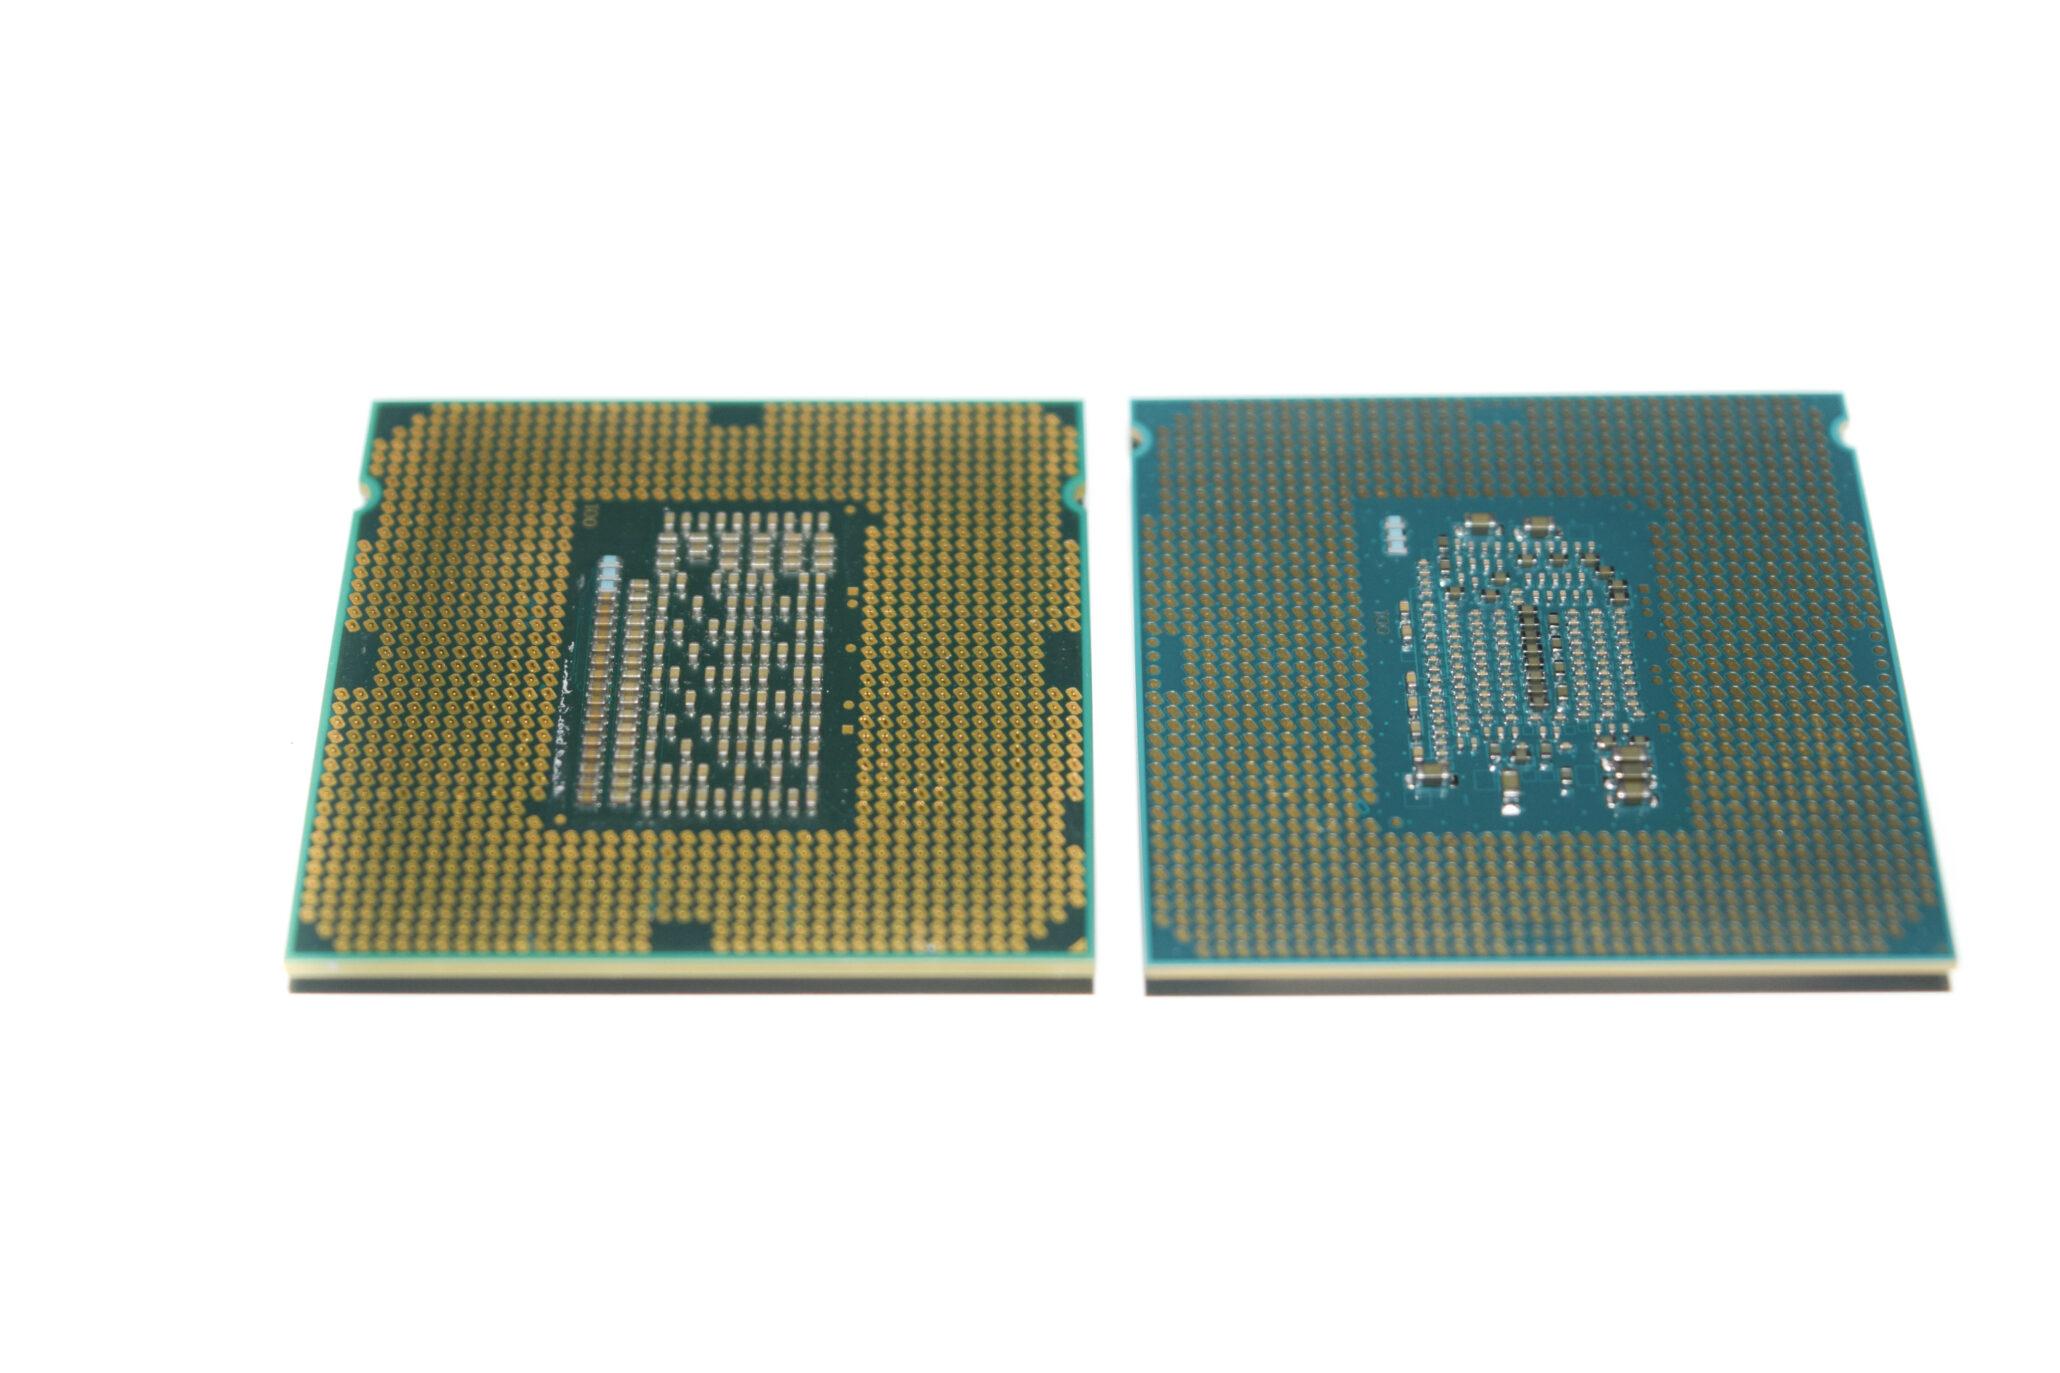 intel-core-i7-6700k-processor_16